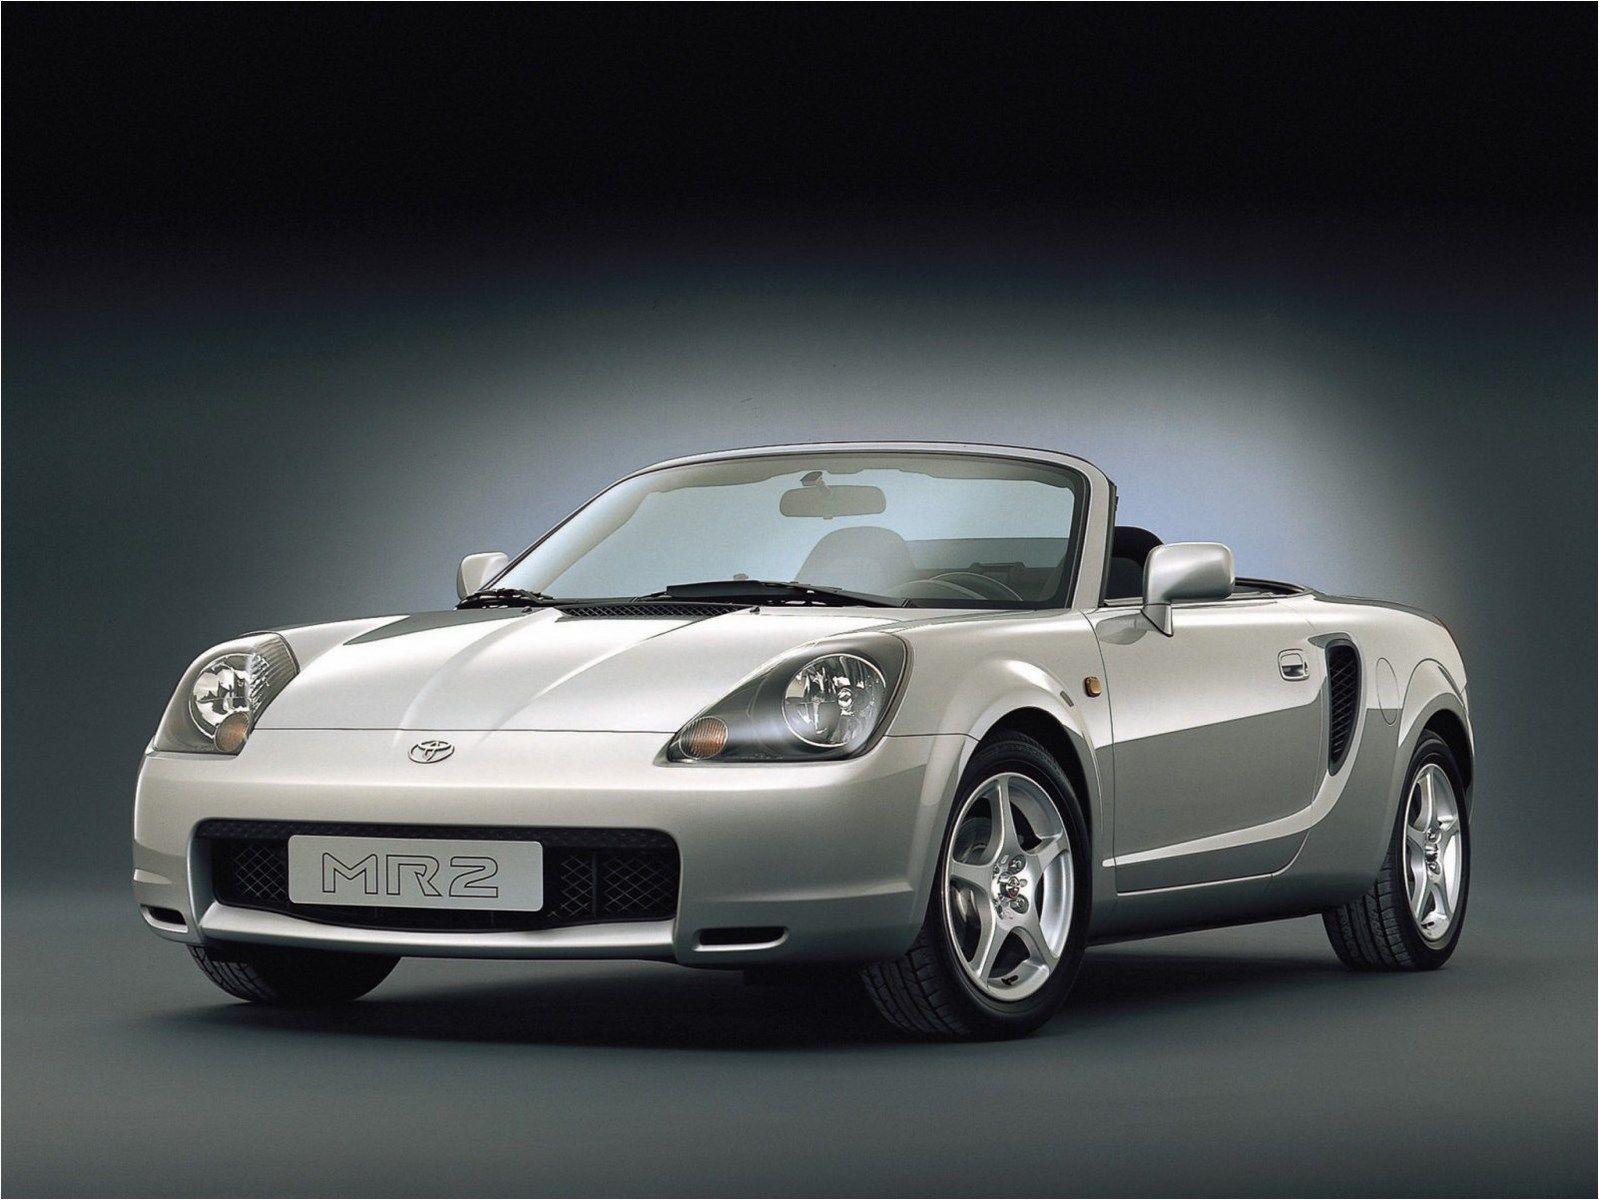 Toyota mr2 spyder research new used toyota mr2 spyder convertibles automotive com